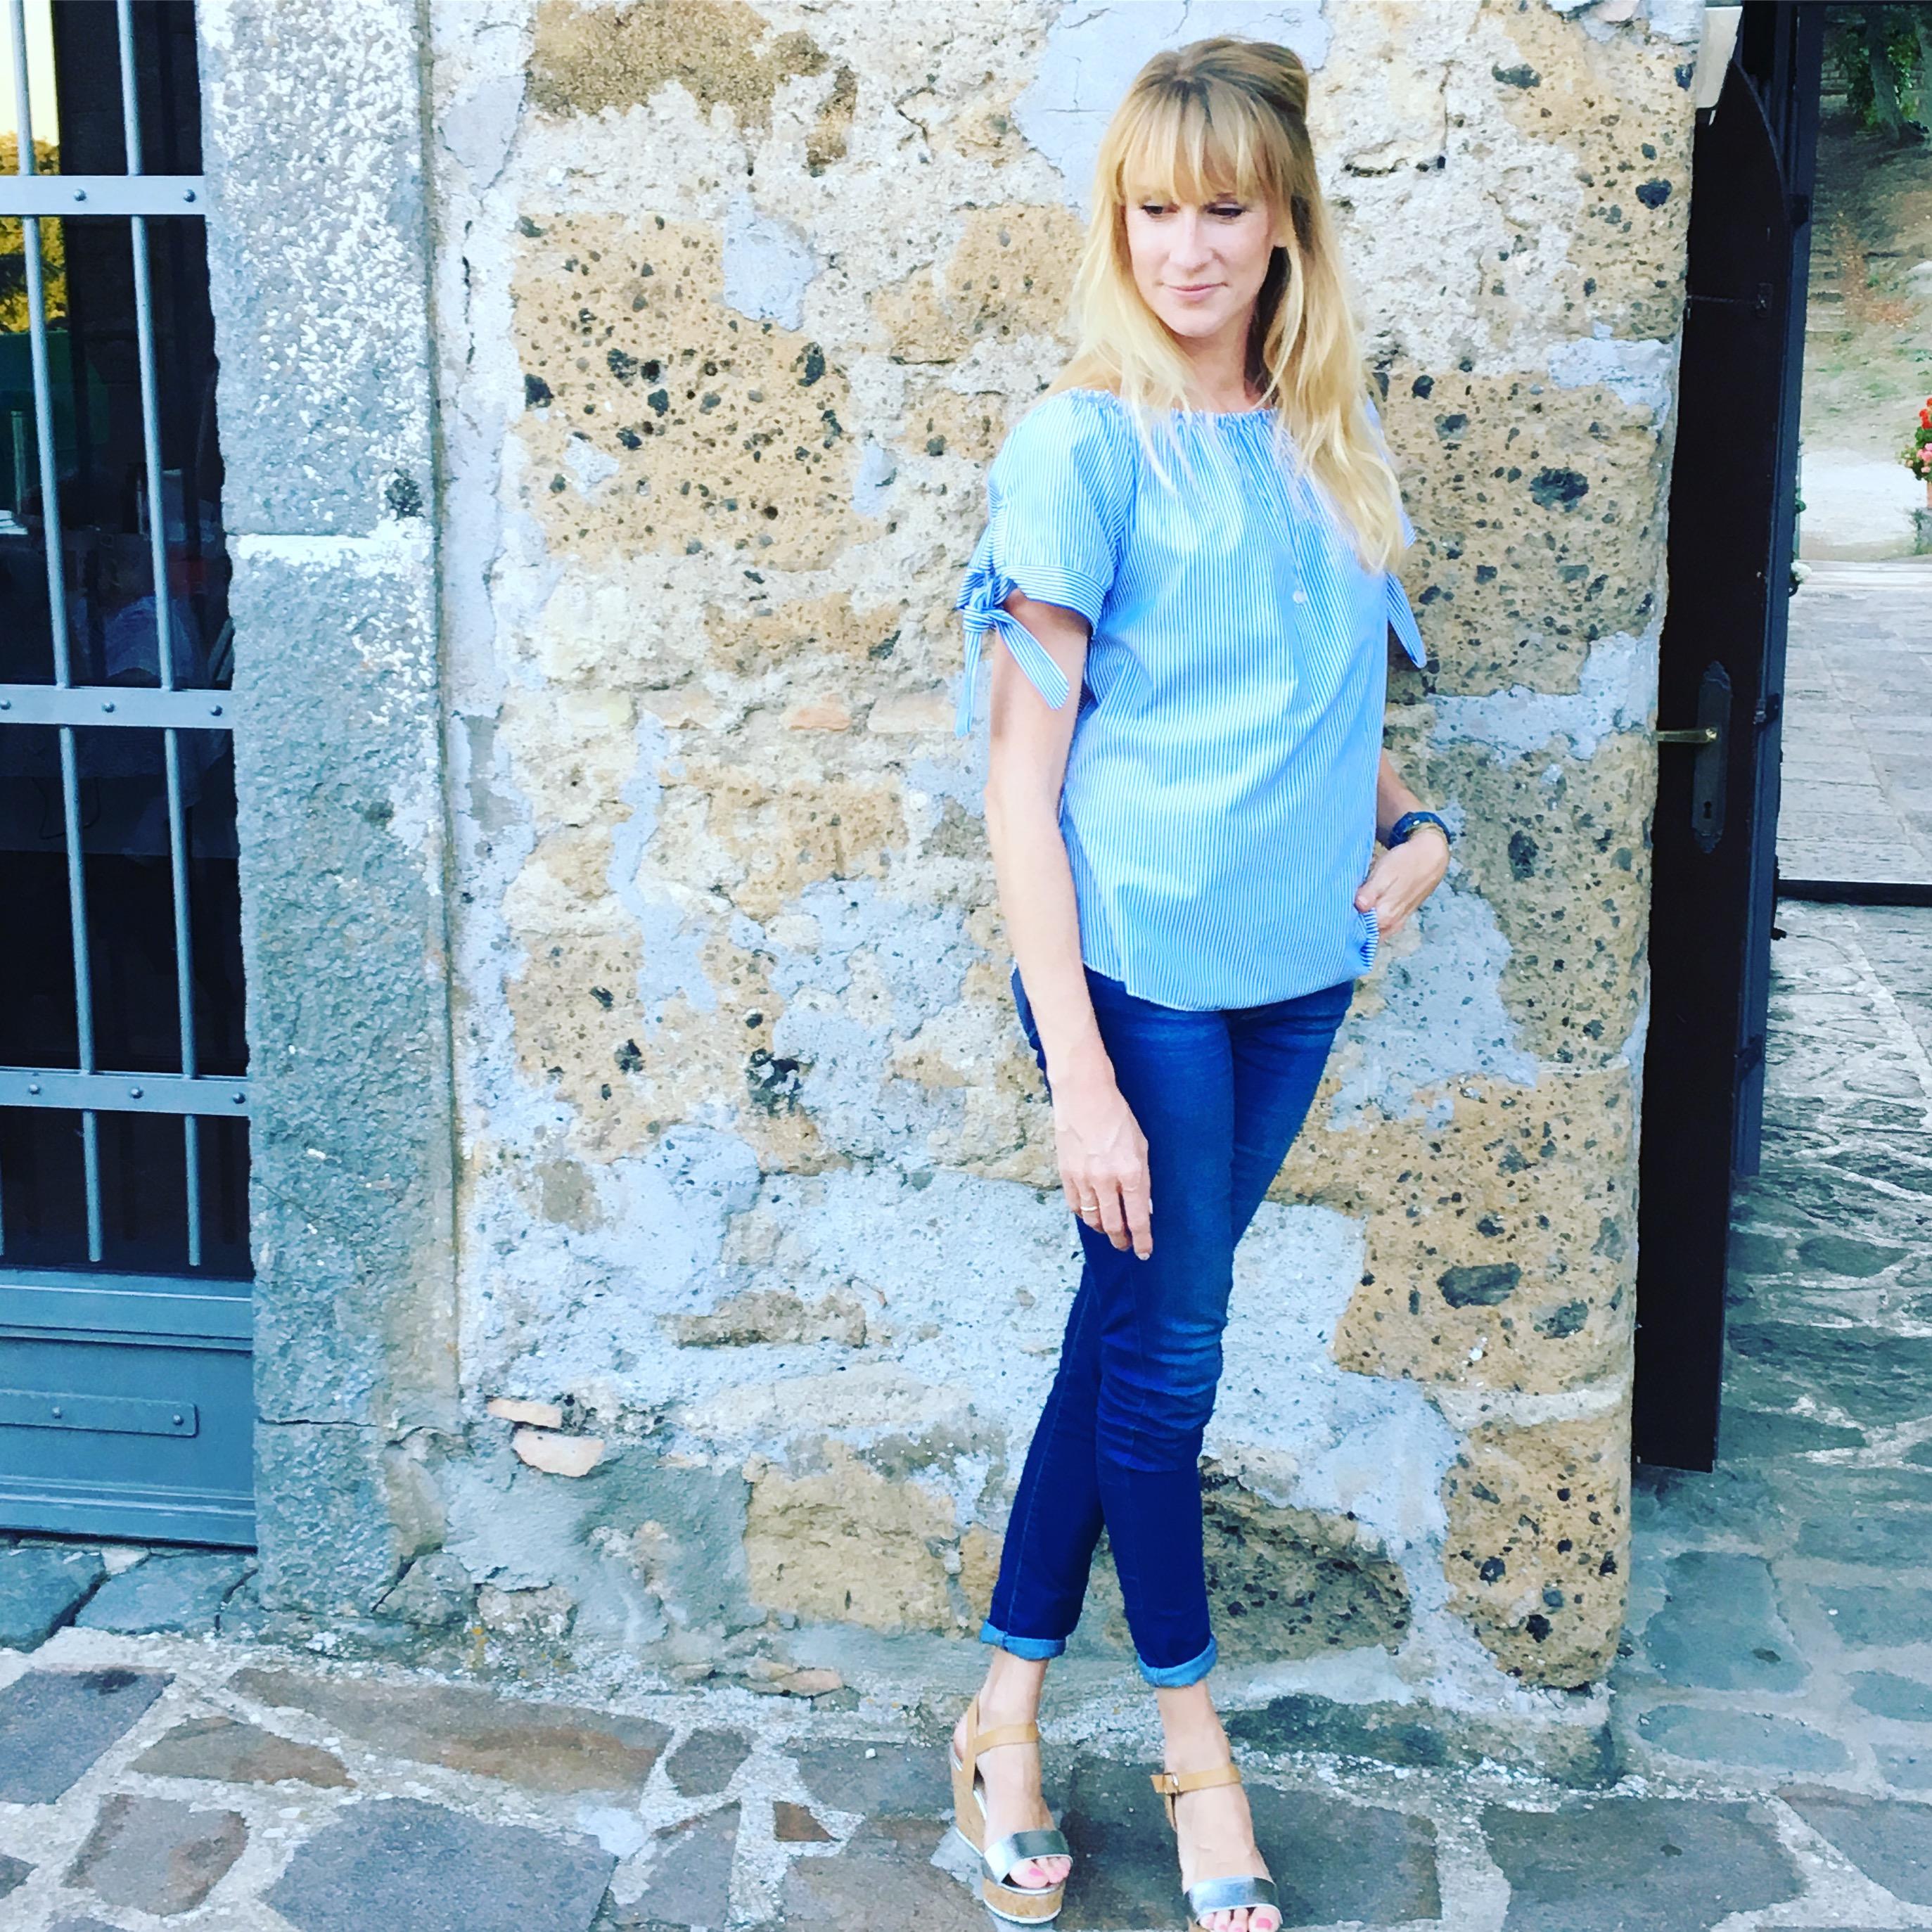 Sommerlook in blau-weiß, sommeroutfit, Sommerbluse, mamablog, modemama, Urlaubsfoto, urlaubslook, carmenblusr